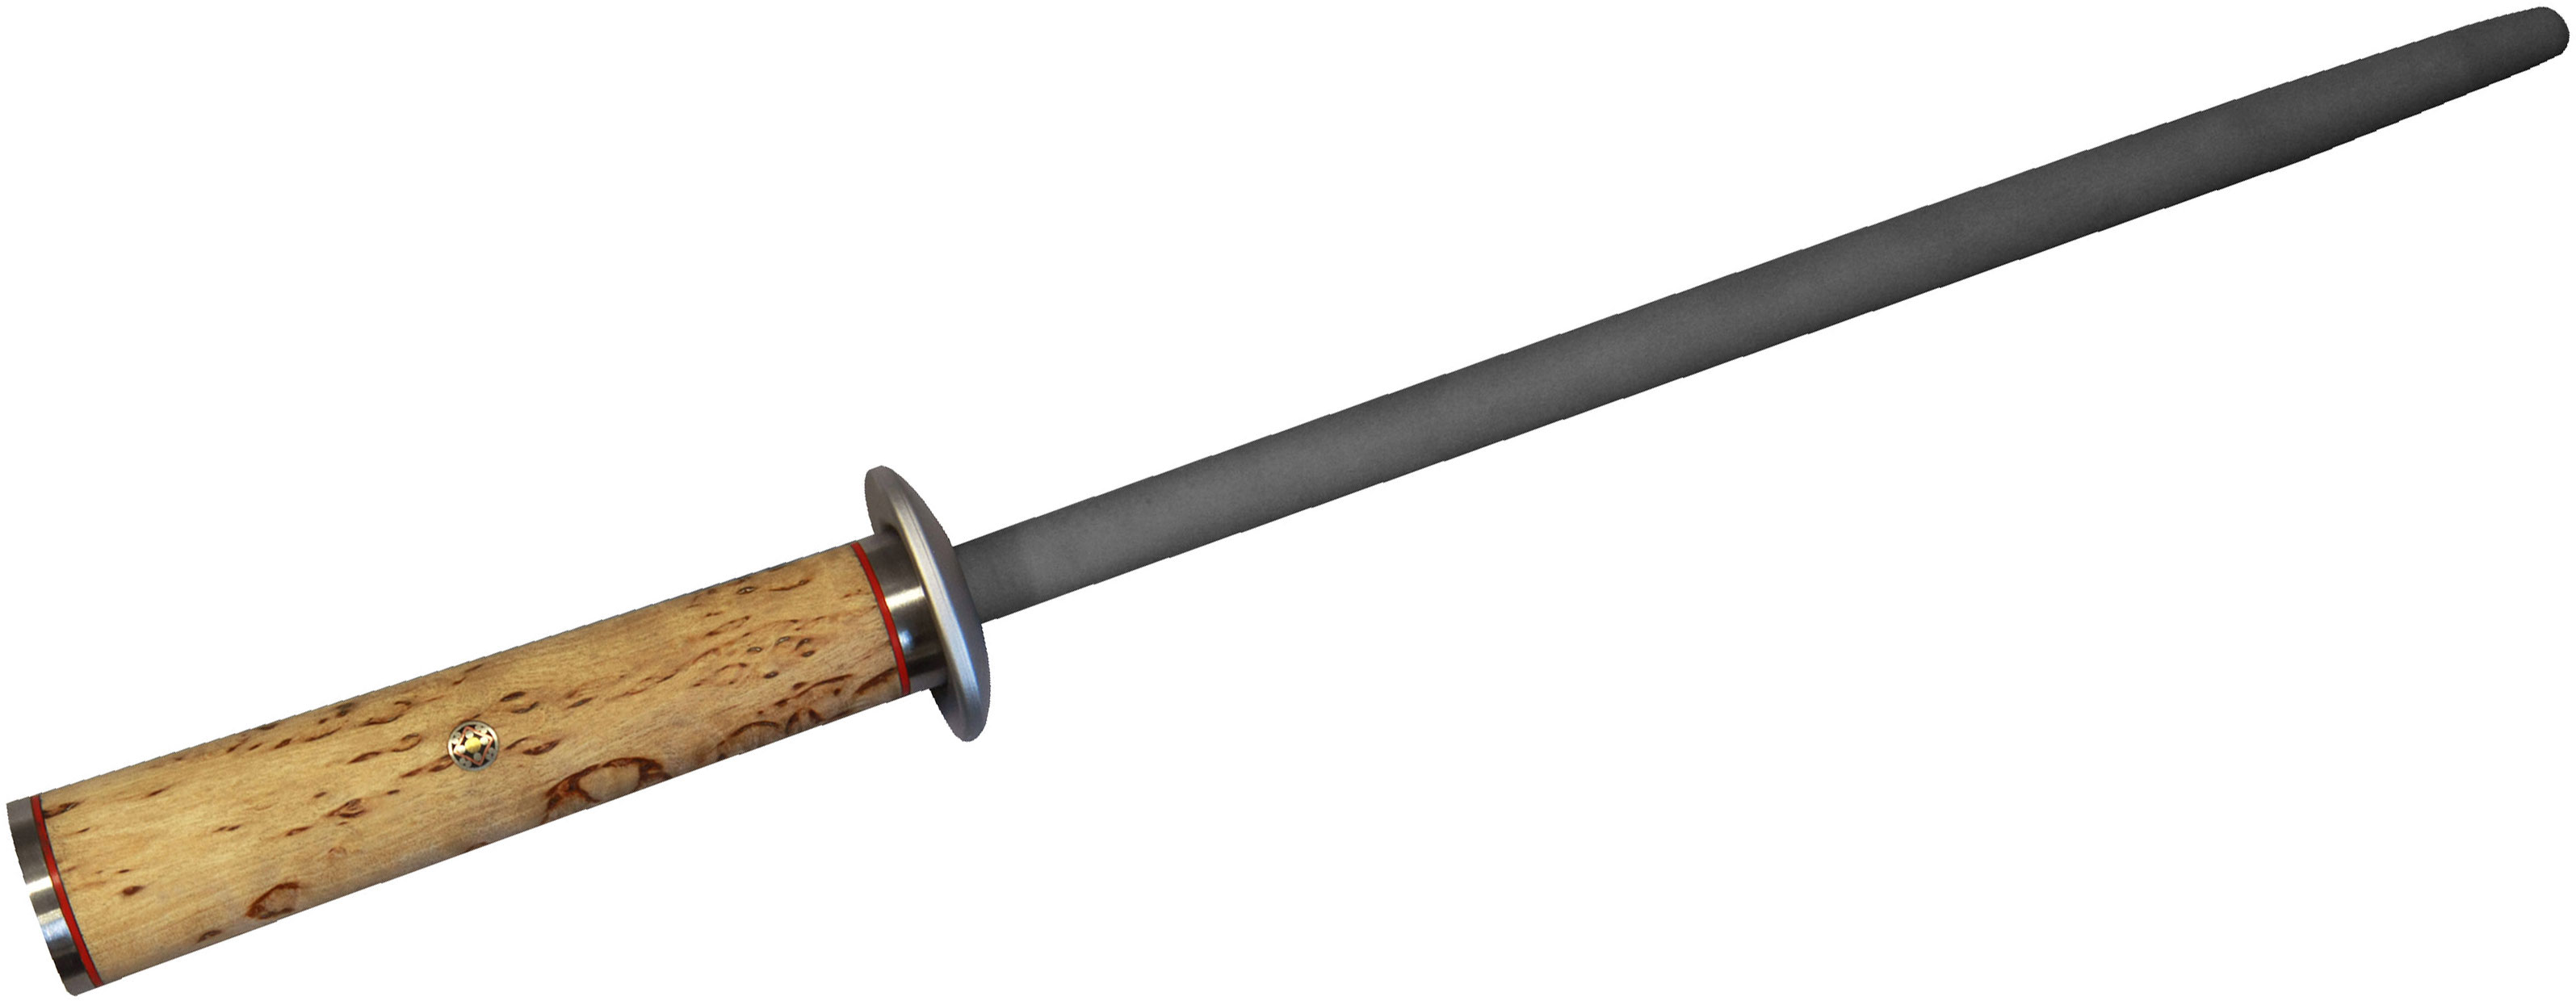 Zwilling J.A. Henckels Miyabi Birchwood SG2 9 inch Sharpening Steel